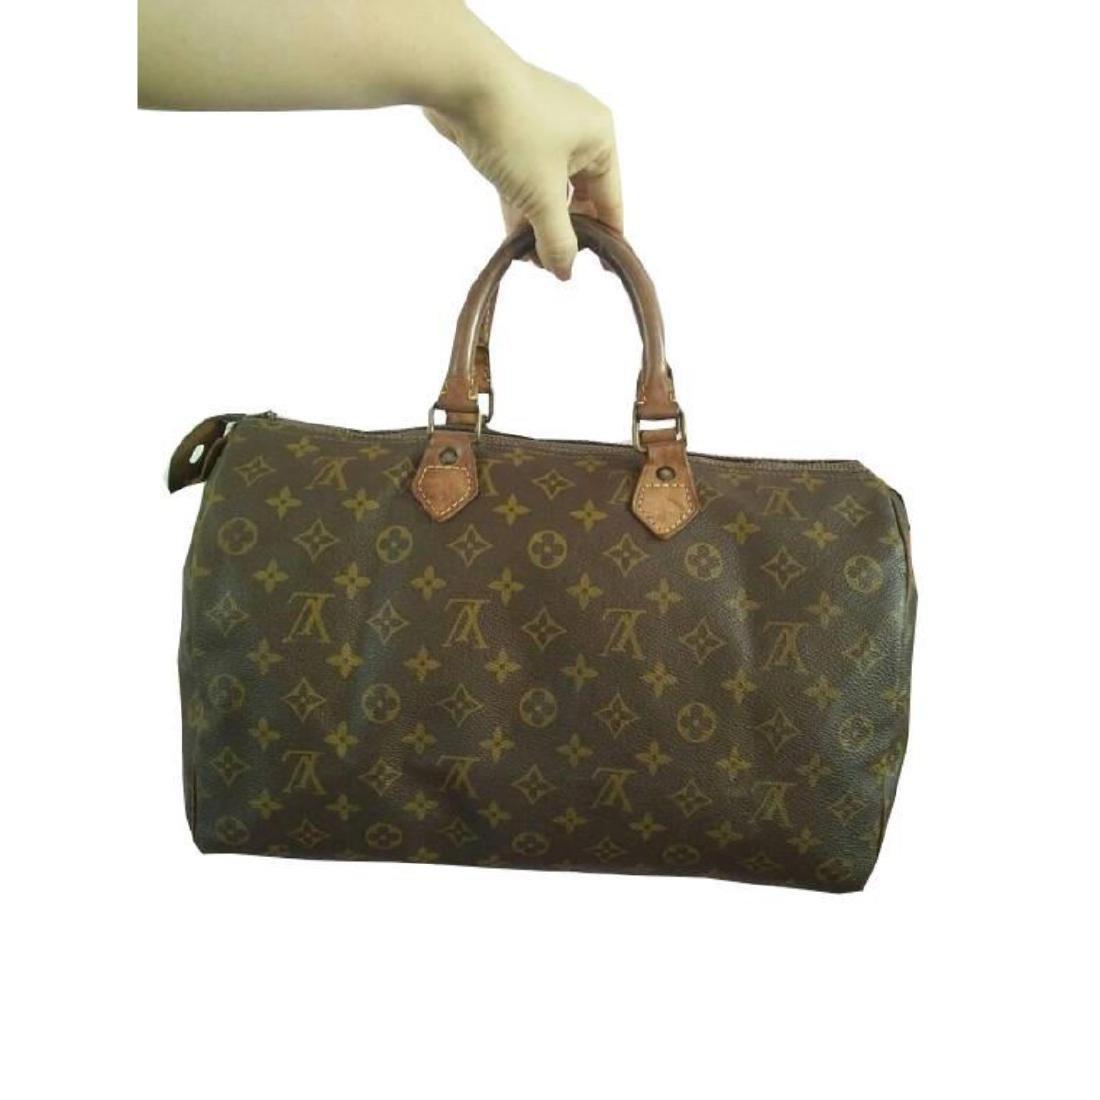 Auth Louis Vuitton Vintage Handbag Speedy 35 Monogram - 3